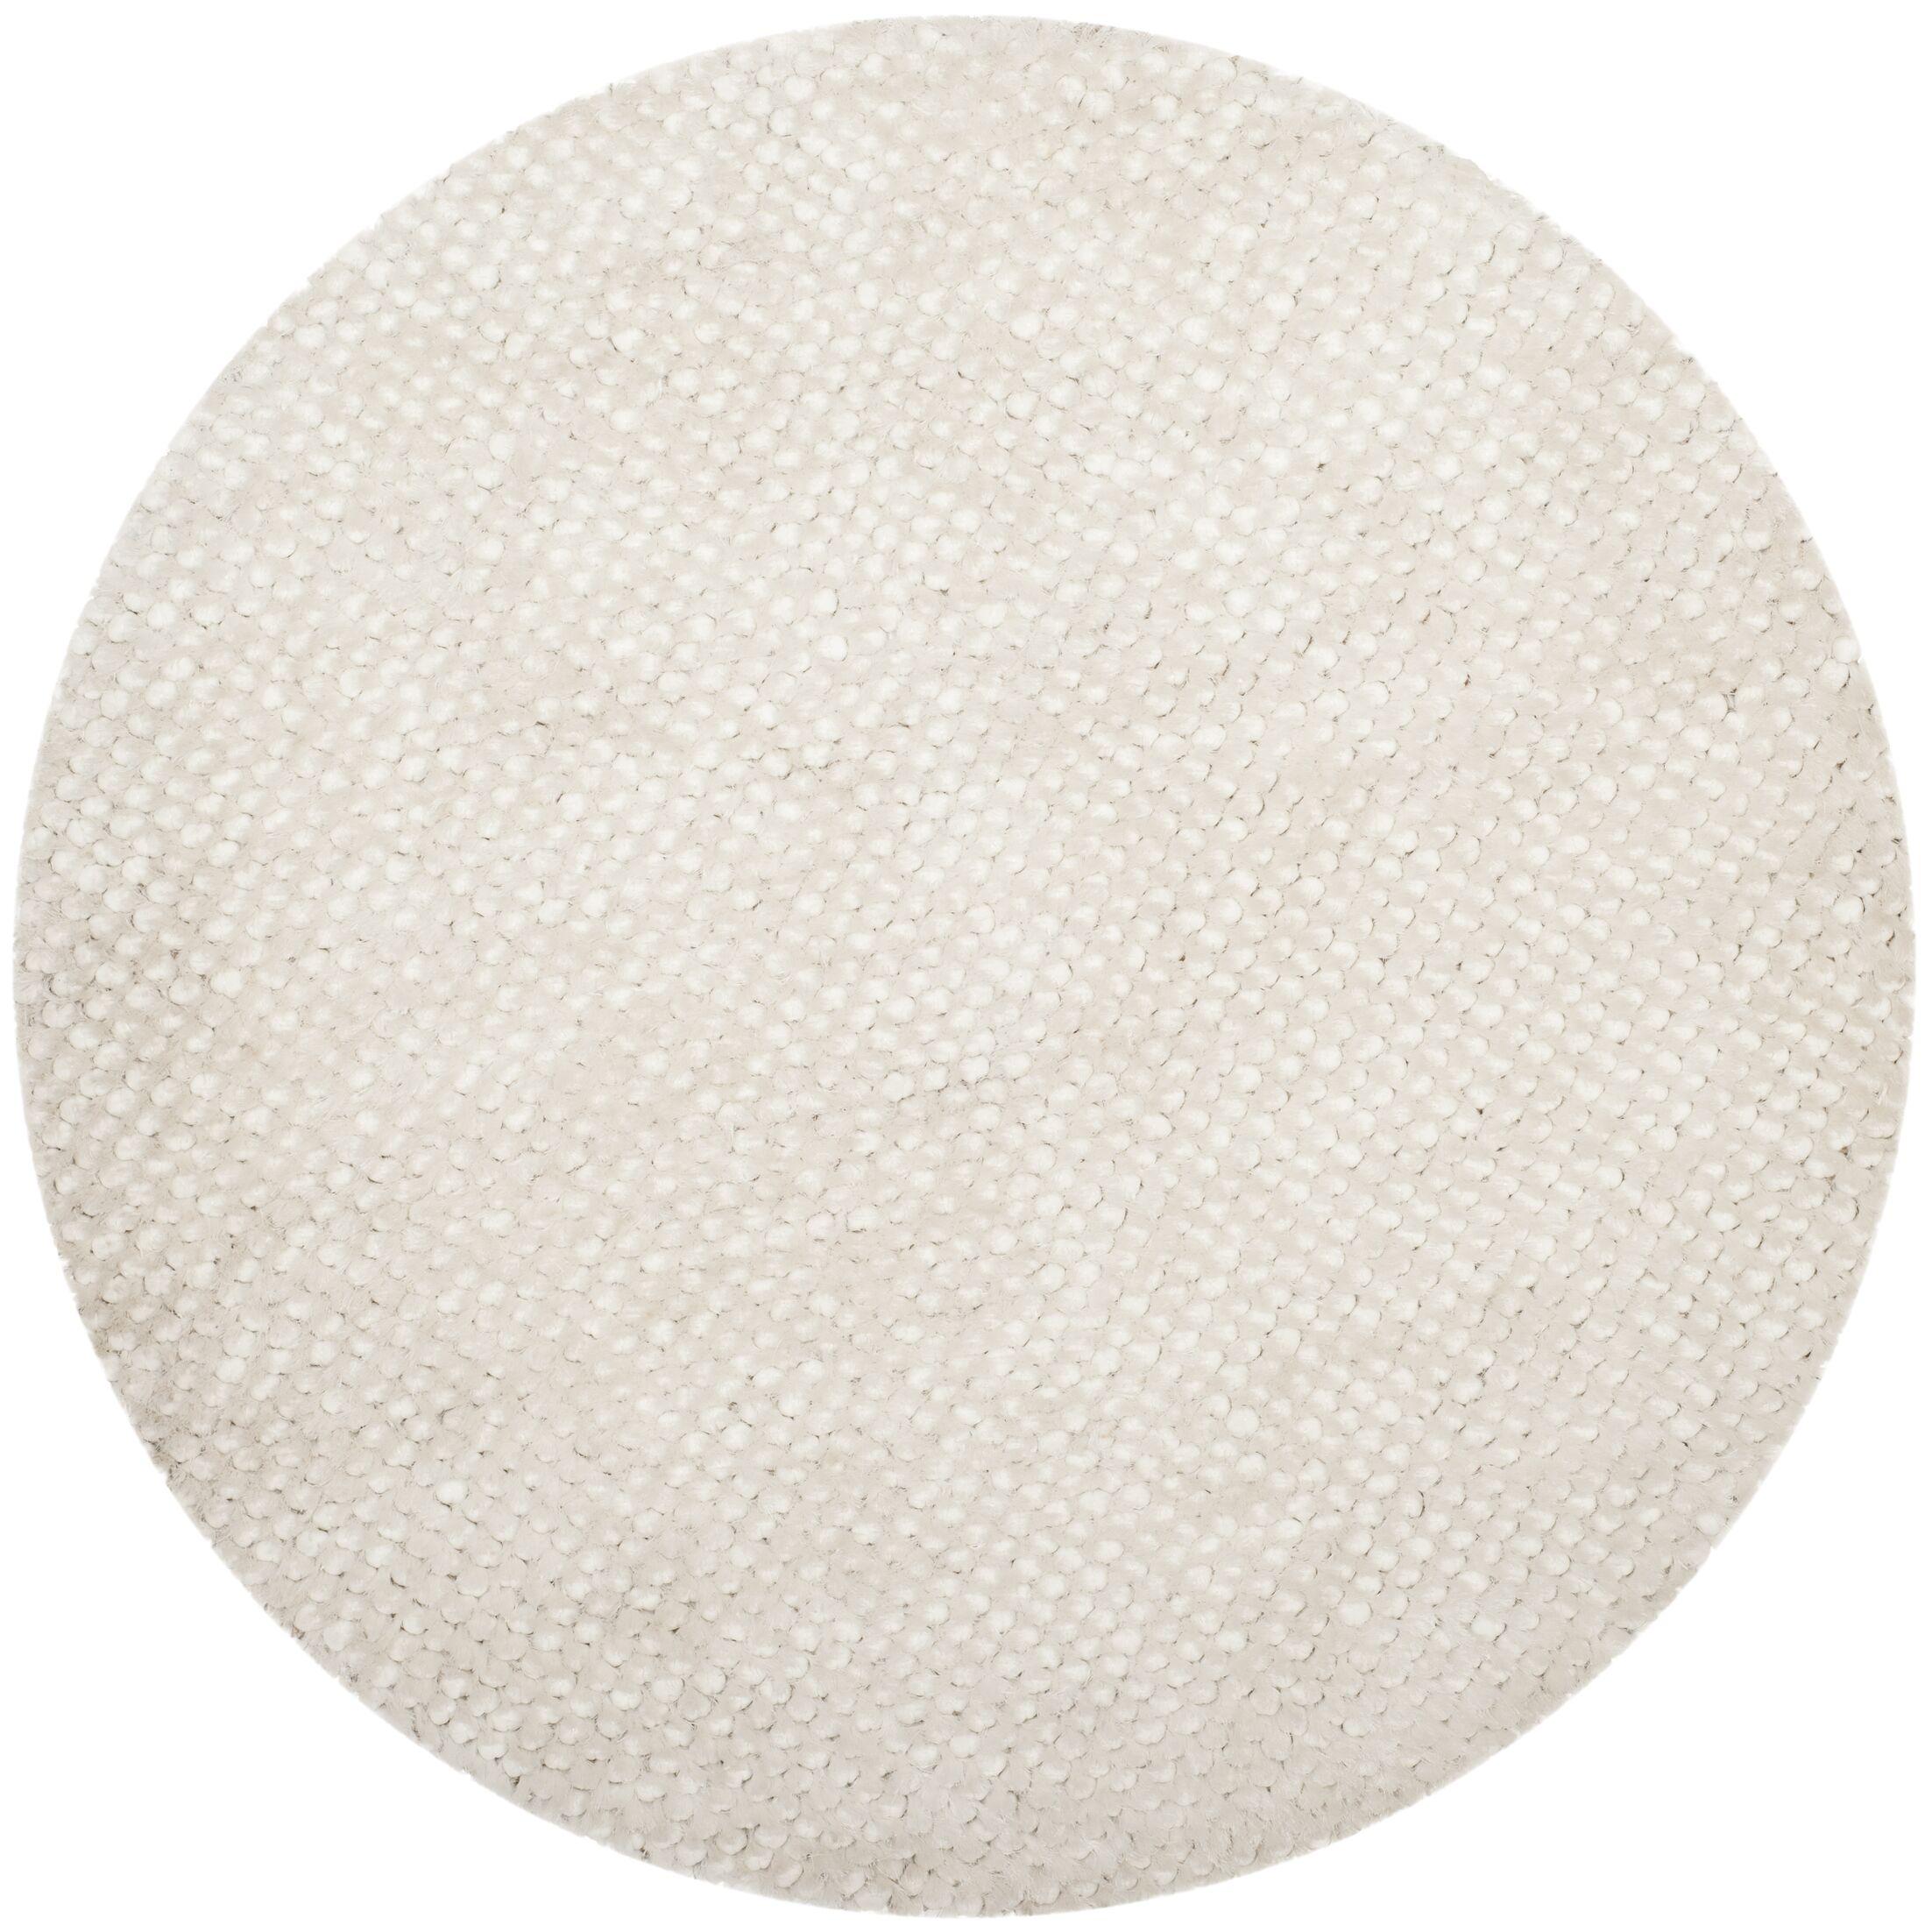 Saint Tropez Hand Woven Cotton White Area Rug Rug Size: Rectangle 5' x 8'